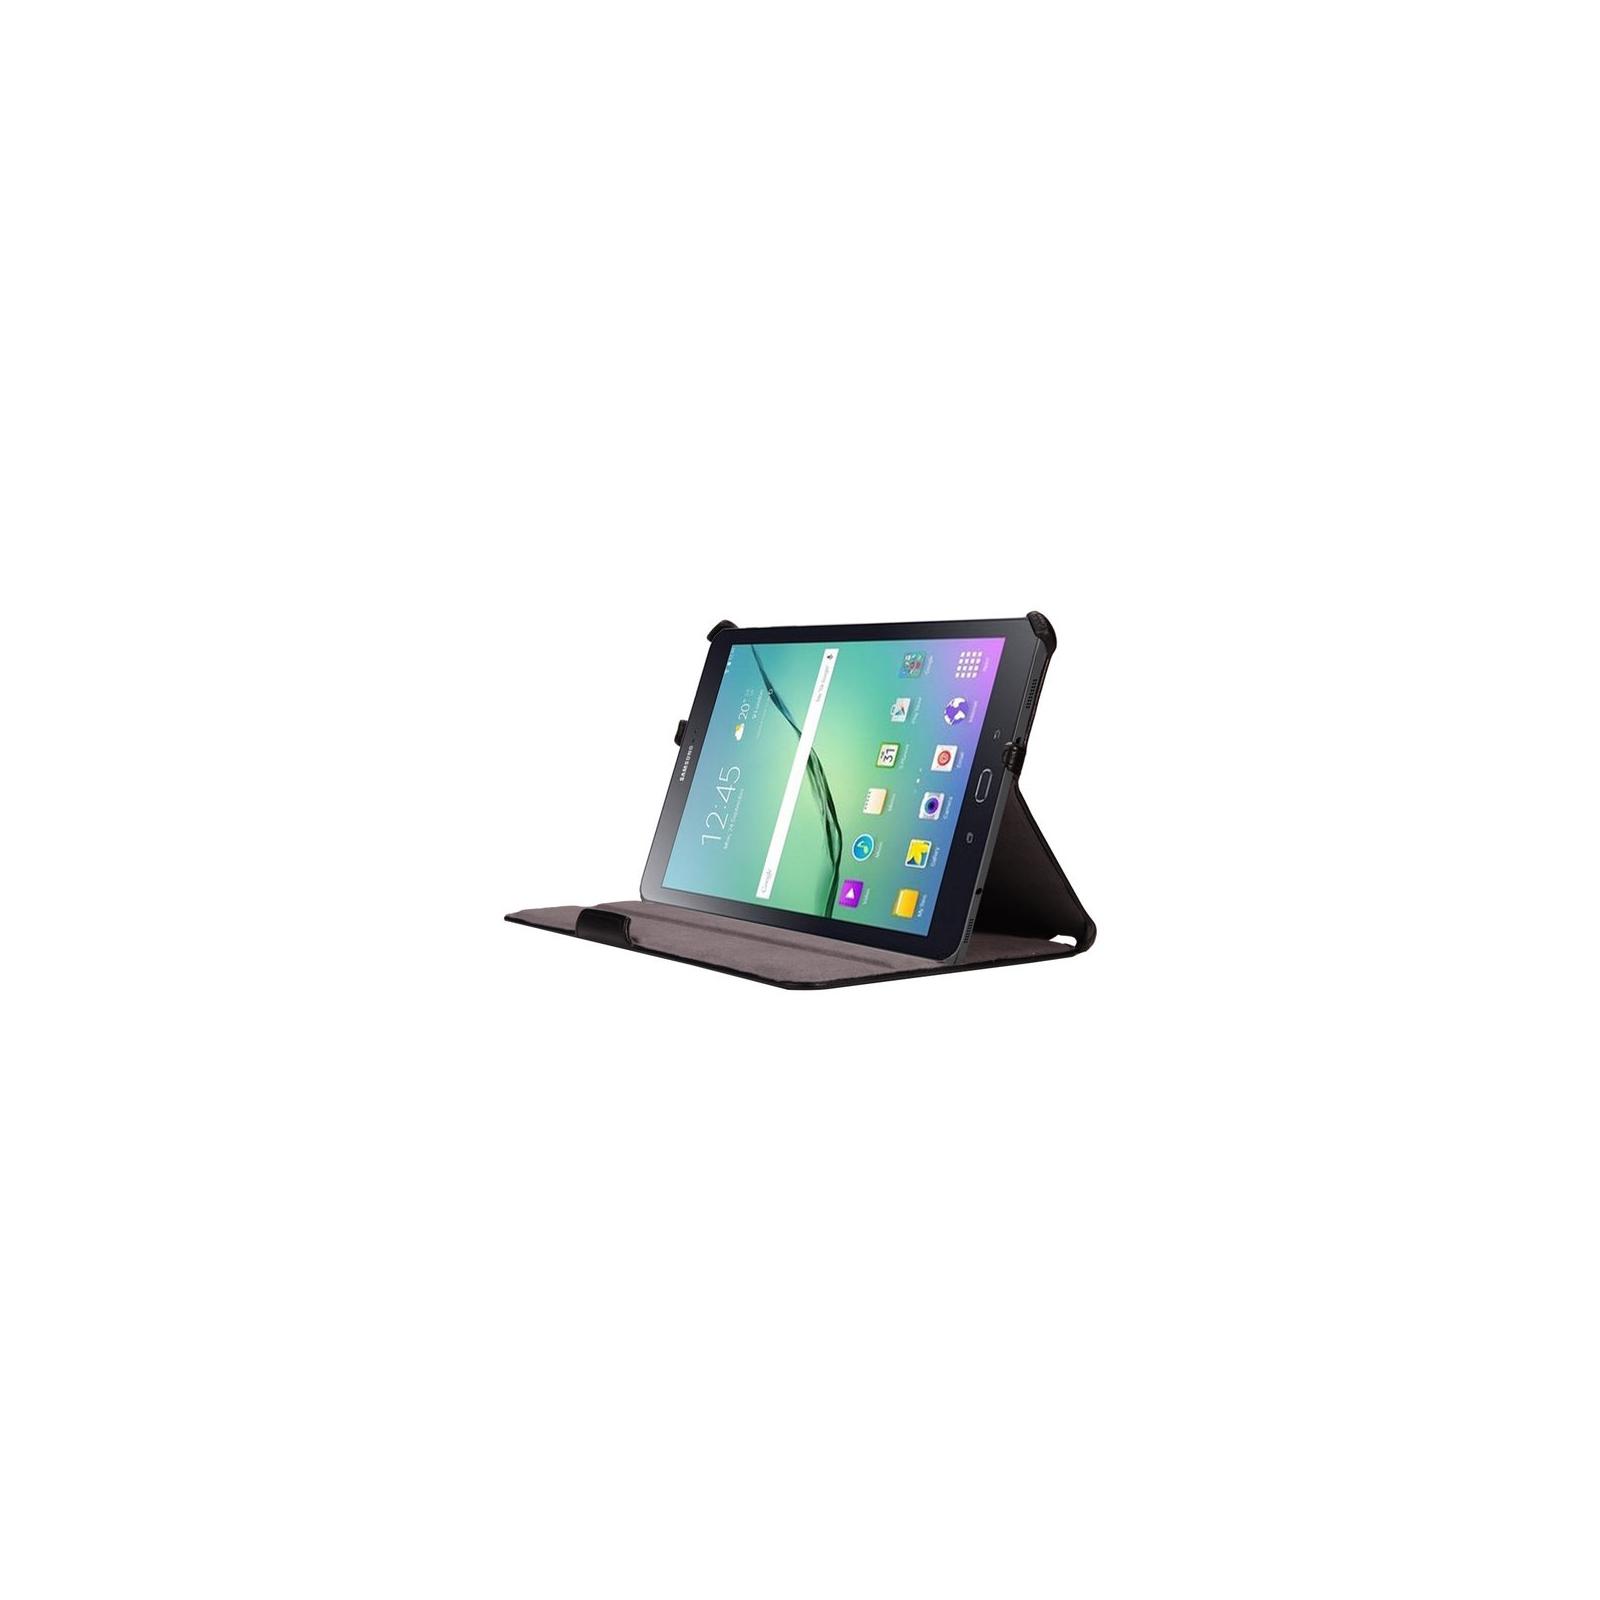 Чехол для планшета AirOn для Samsung Galaxy Tab S 2 8.0 black (4822352777418) изображение 5